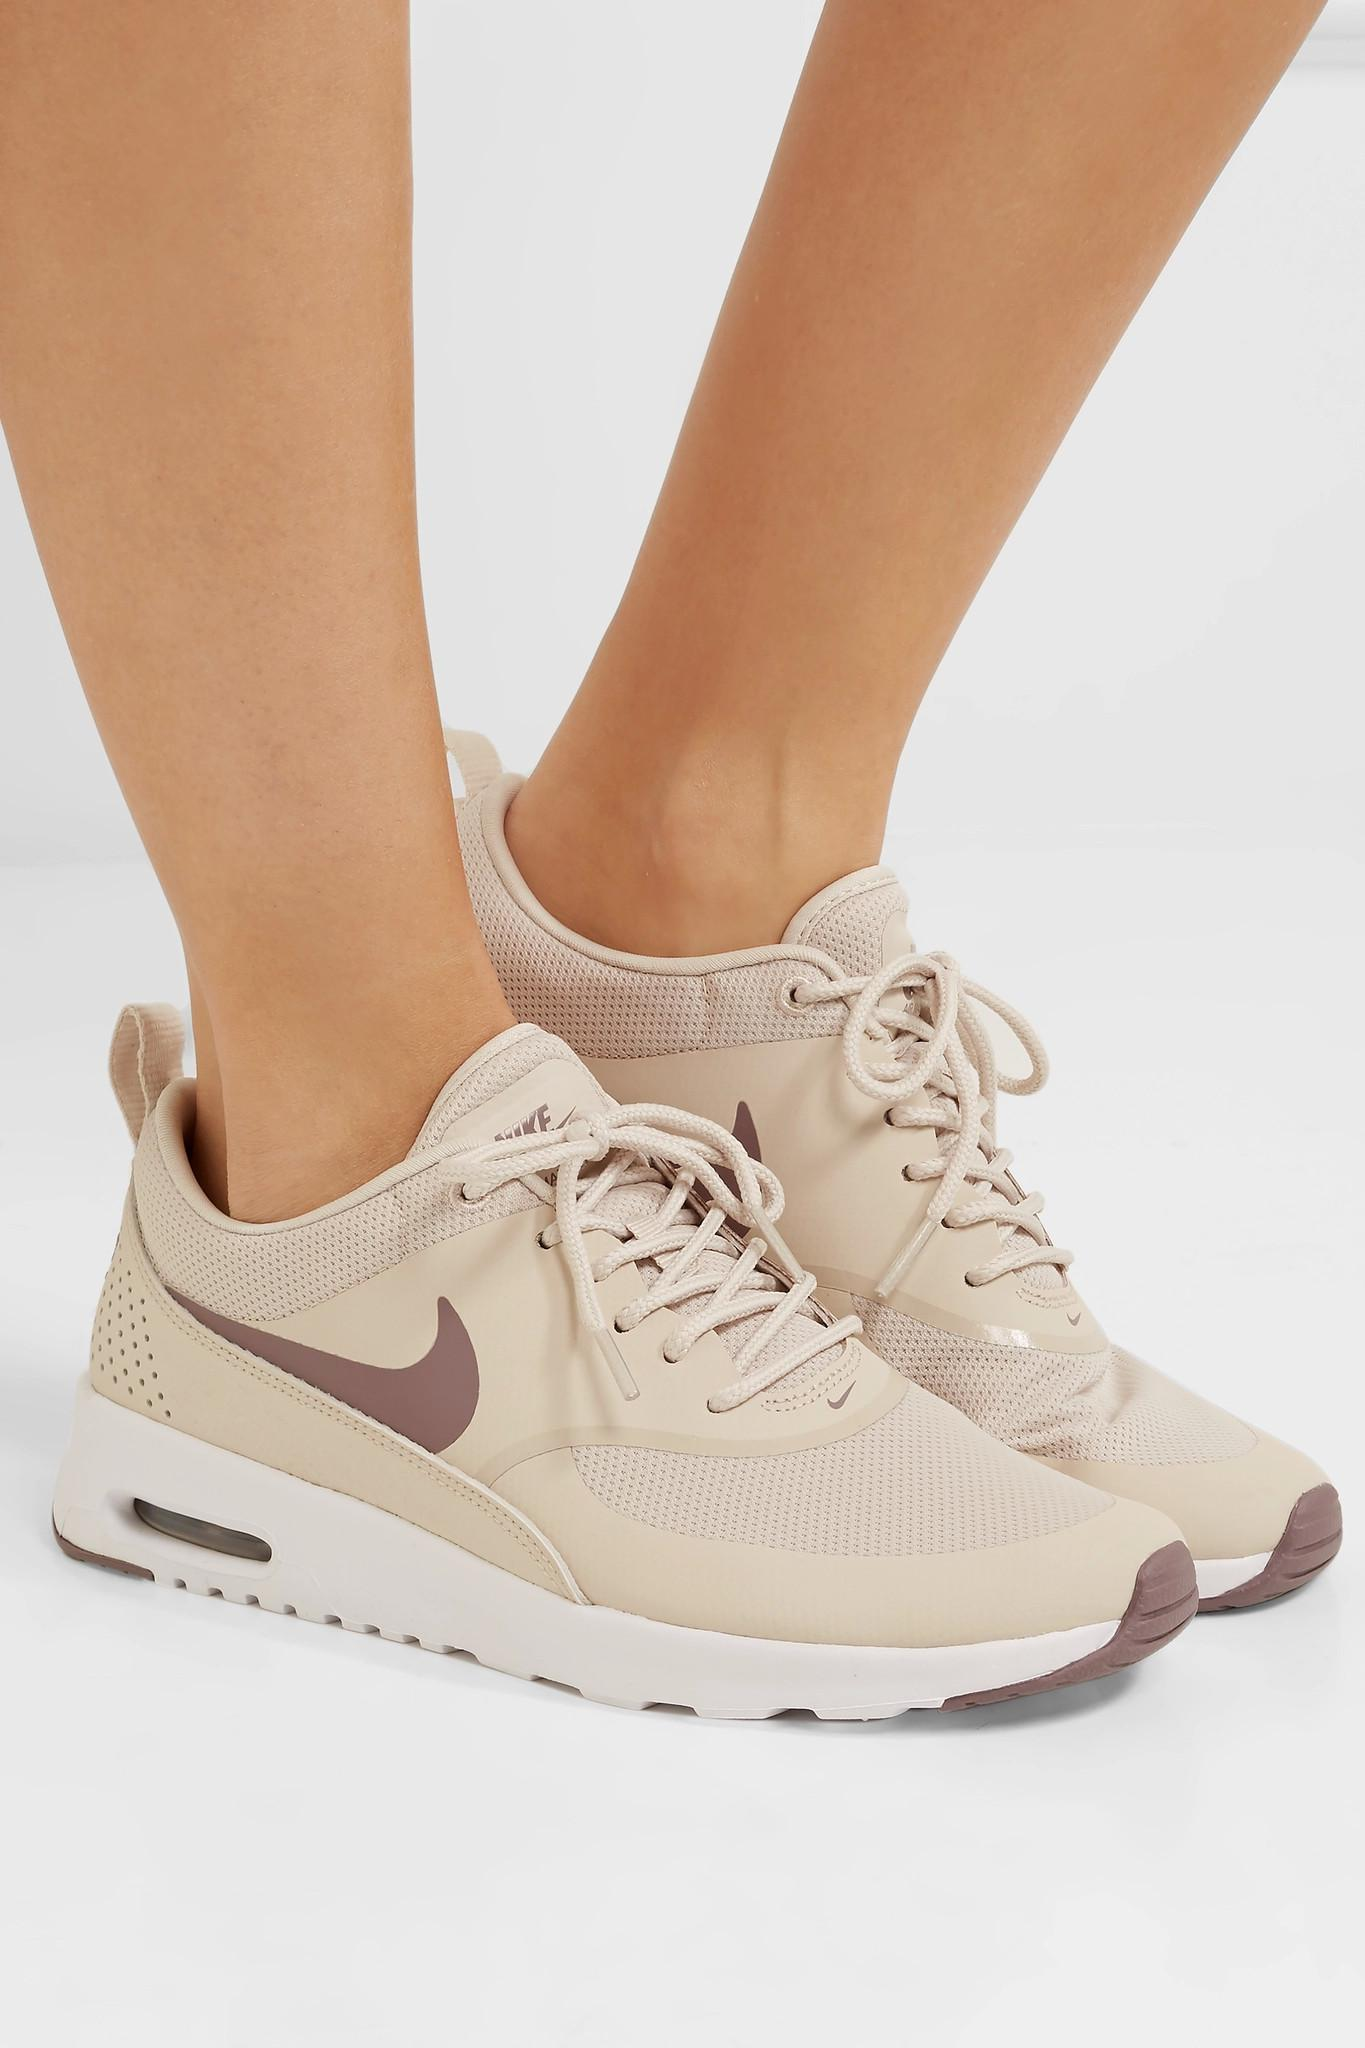 f6f3ecdb50 ... sneakers Lyst - Nike Air Max Thea Rubber, Stretch-mesh And Croc-effec  ...